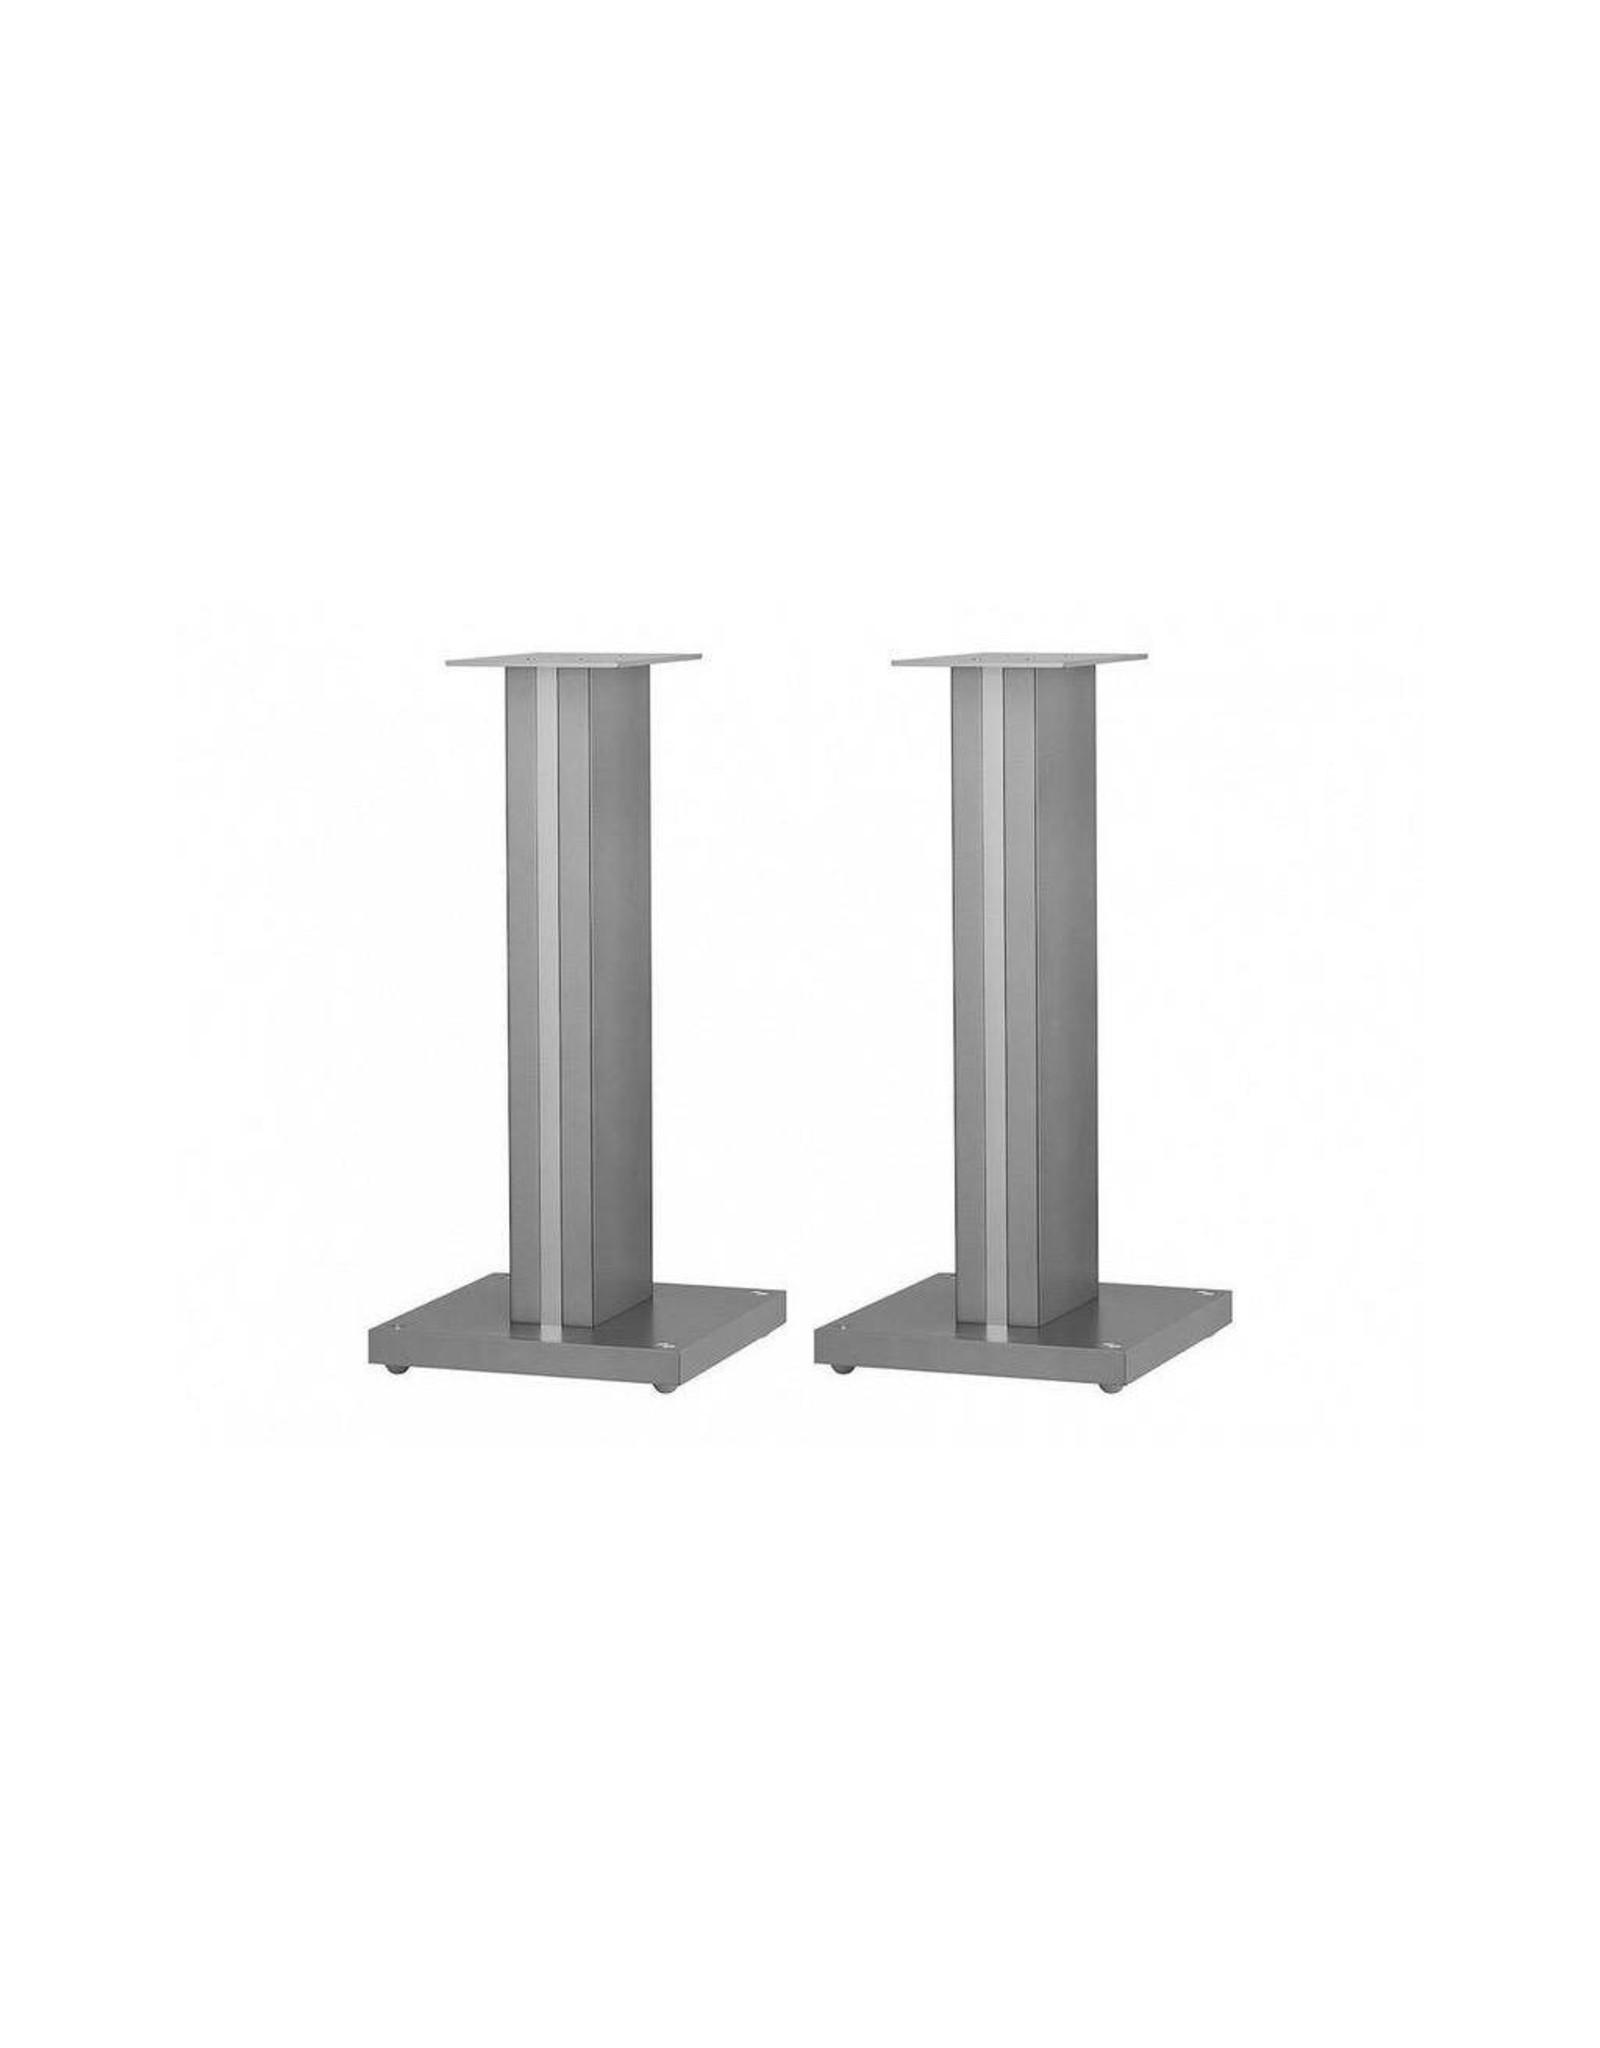 BOWERS & WILKINS B&W FS700 Floor Stands 700 S2 Series (pair)